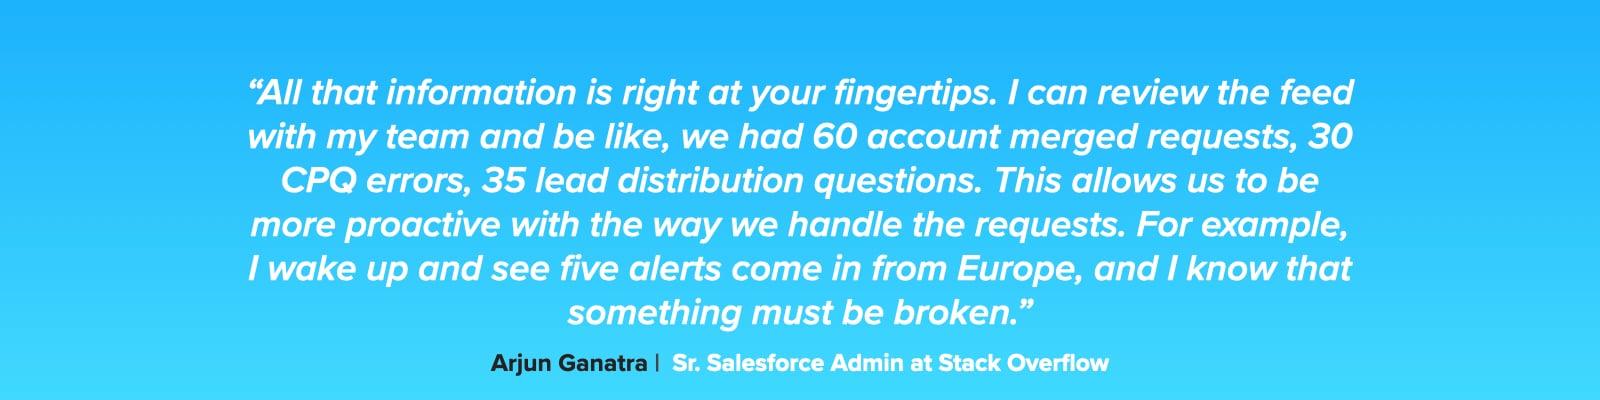 StackOverflow #5.001